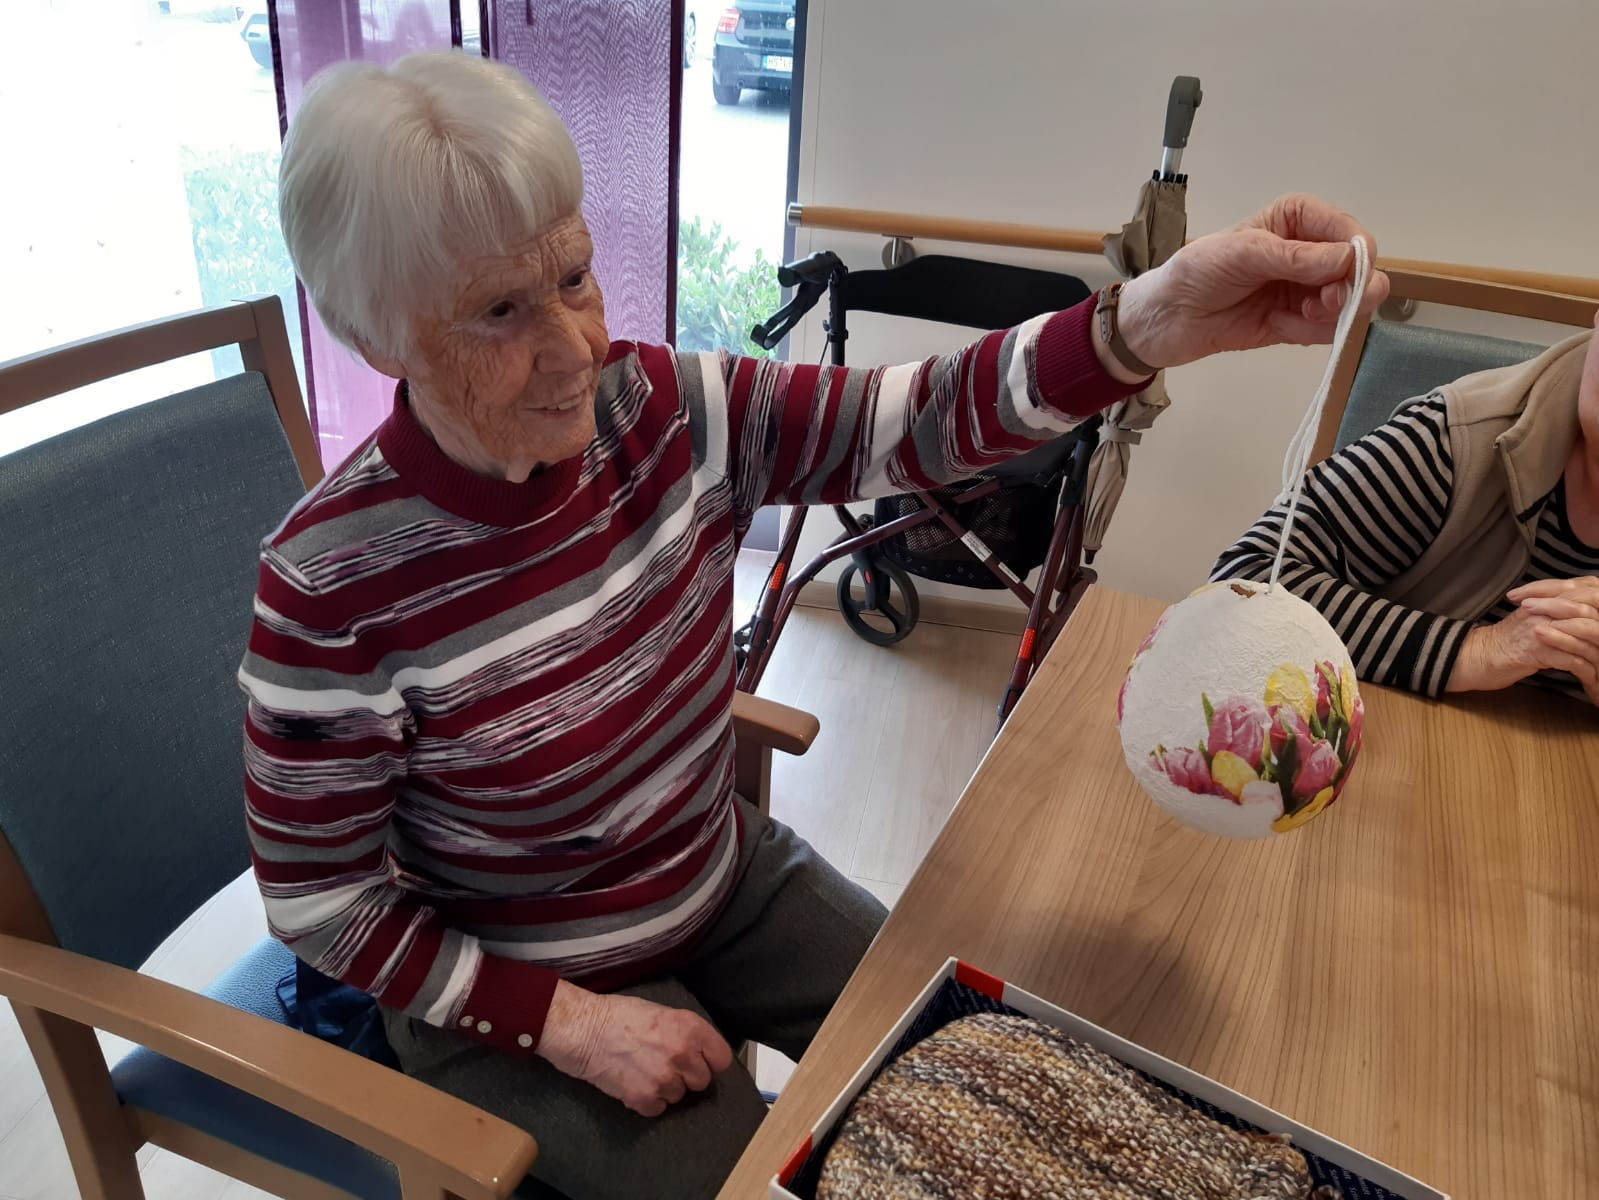 Kreatives Osterbasteln in der AWO-Tagespflege Heinsberg 1